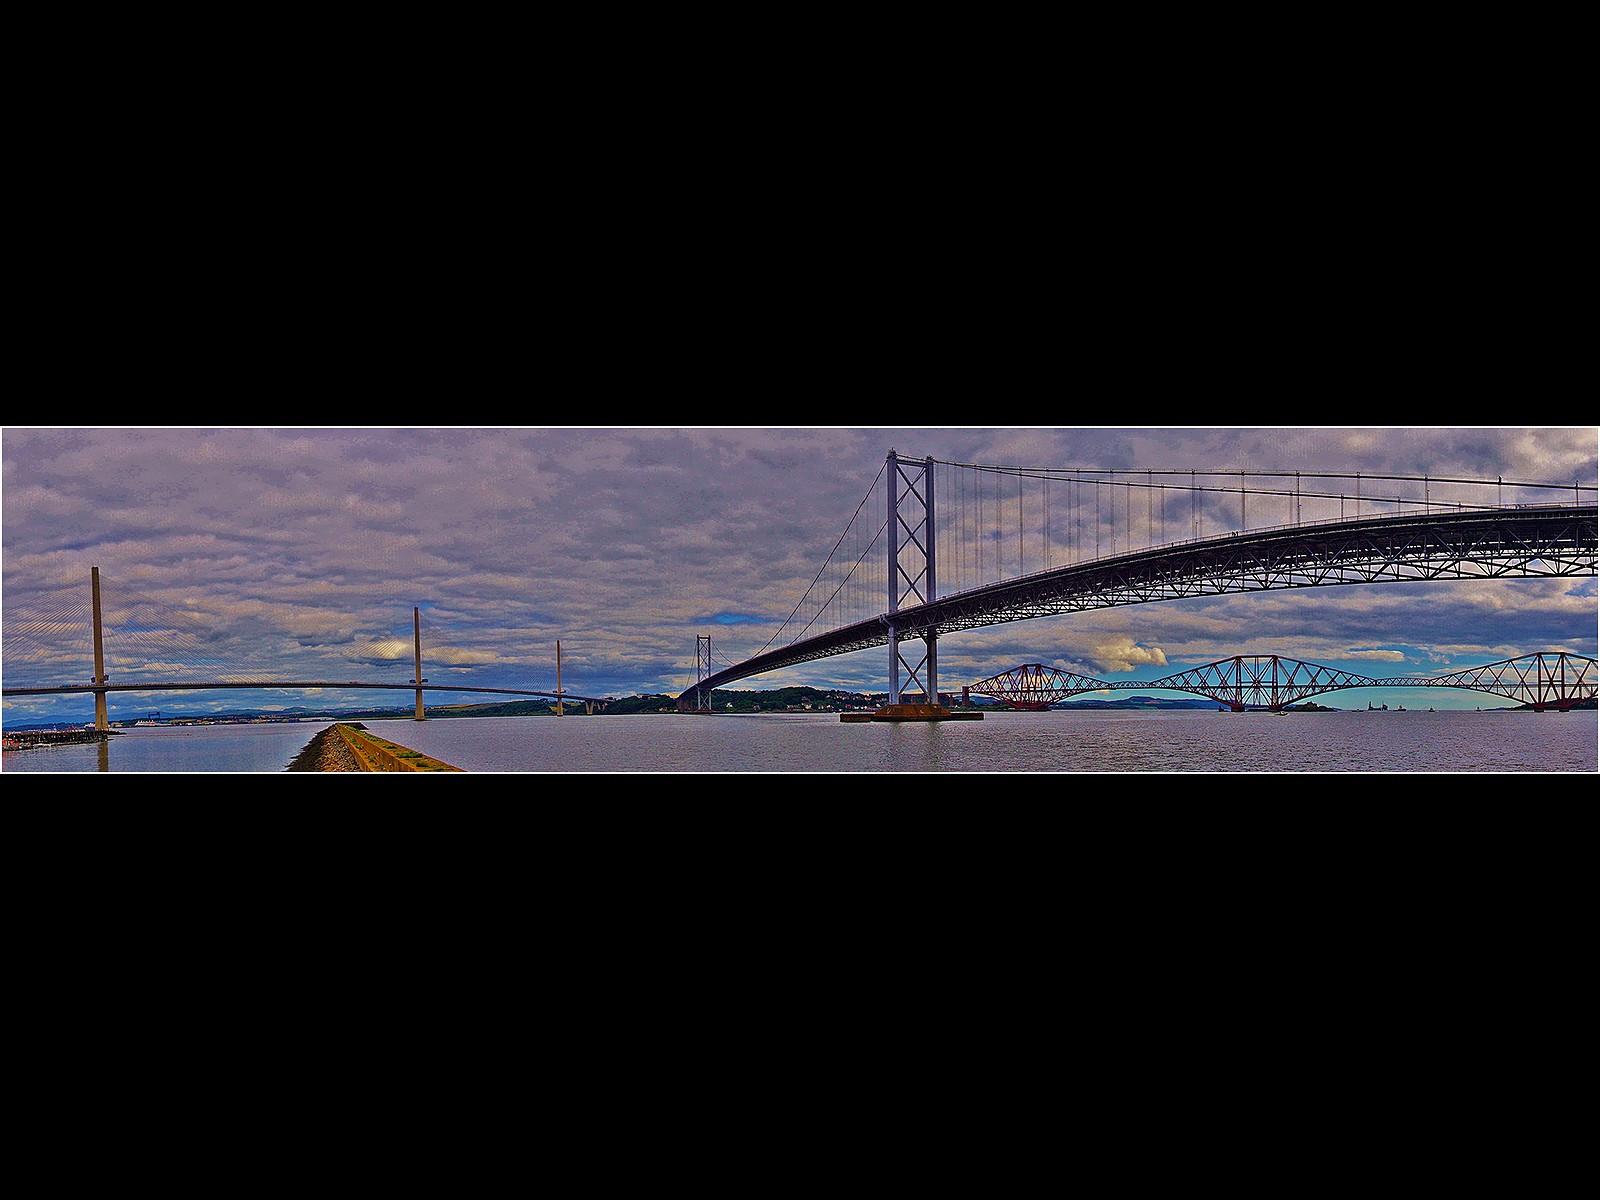 9. Three Bridges